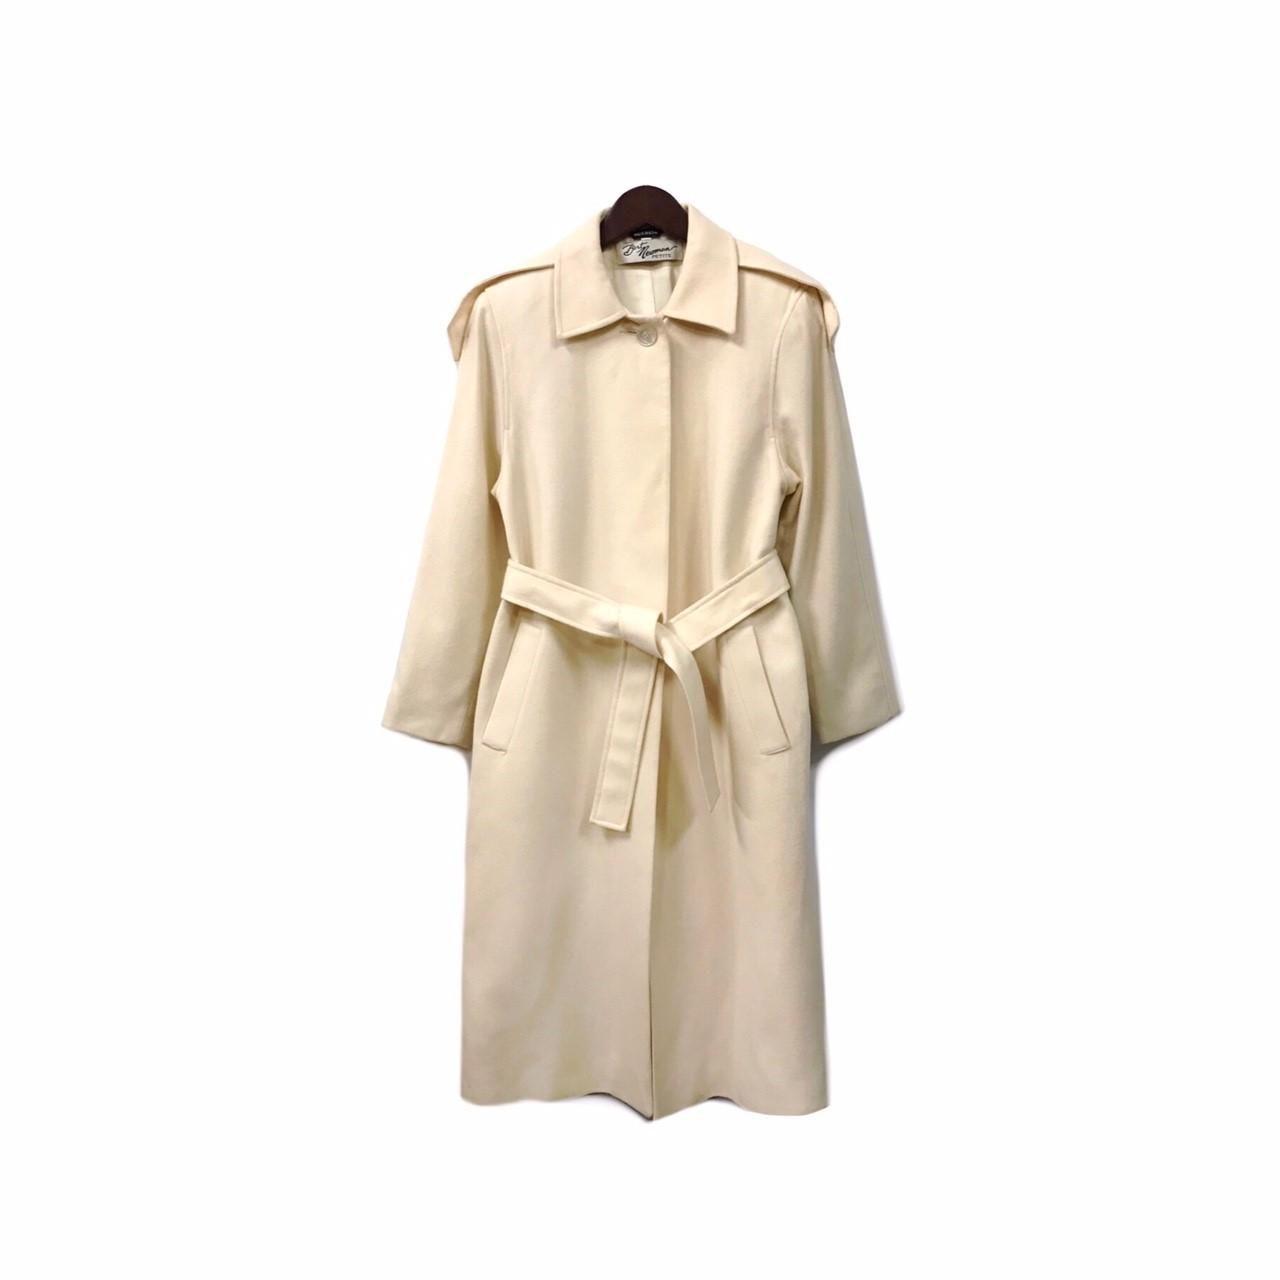 USED - Wool Long Coat ¥20500+tax→¥14350+tax